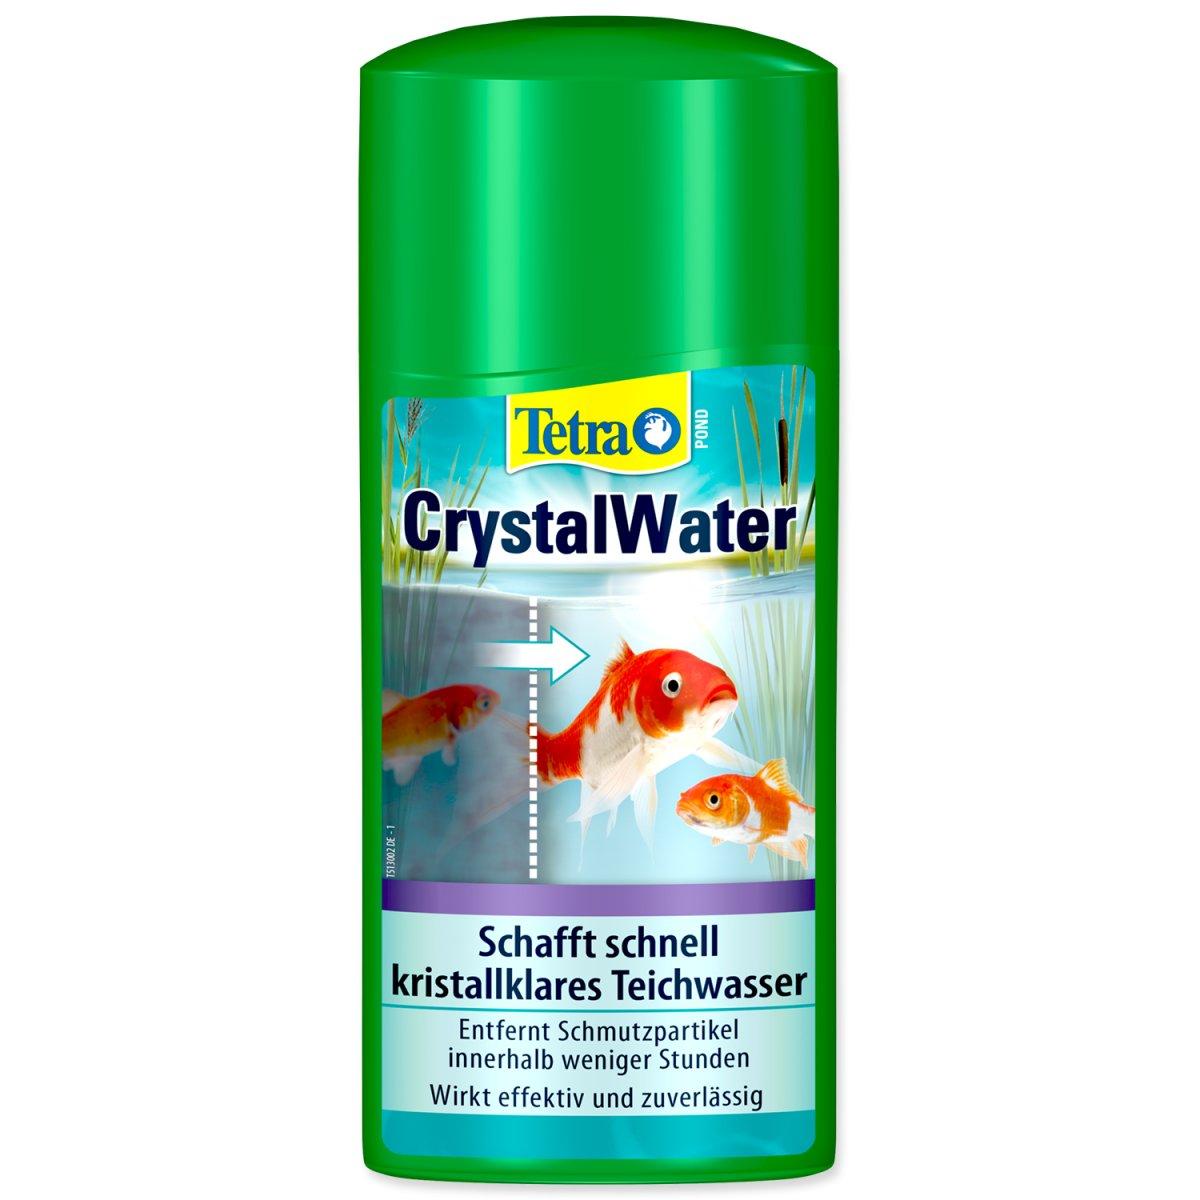 TETRA Pond CrystalWater (500ml)